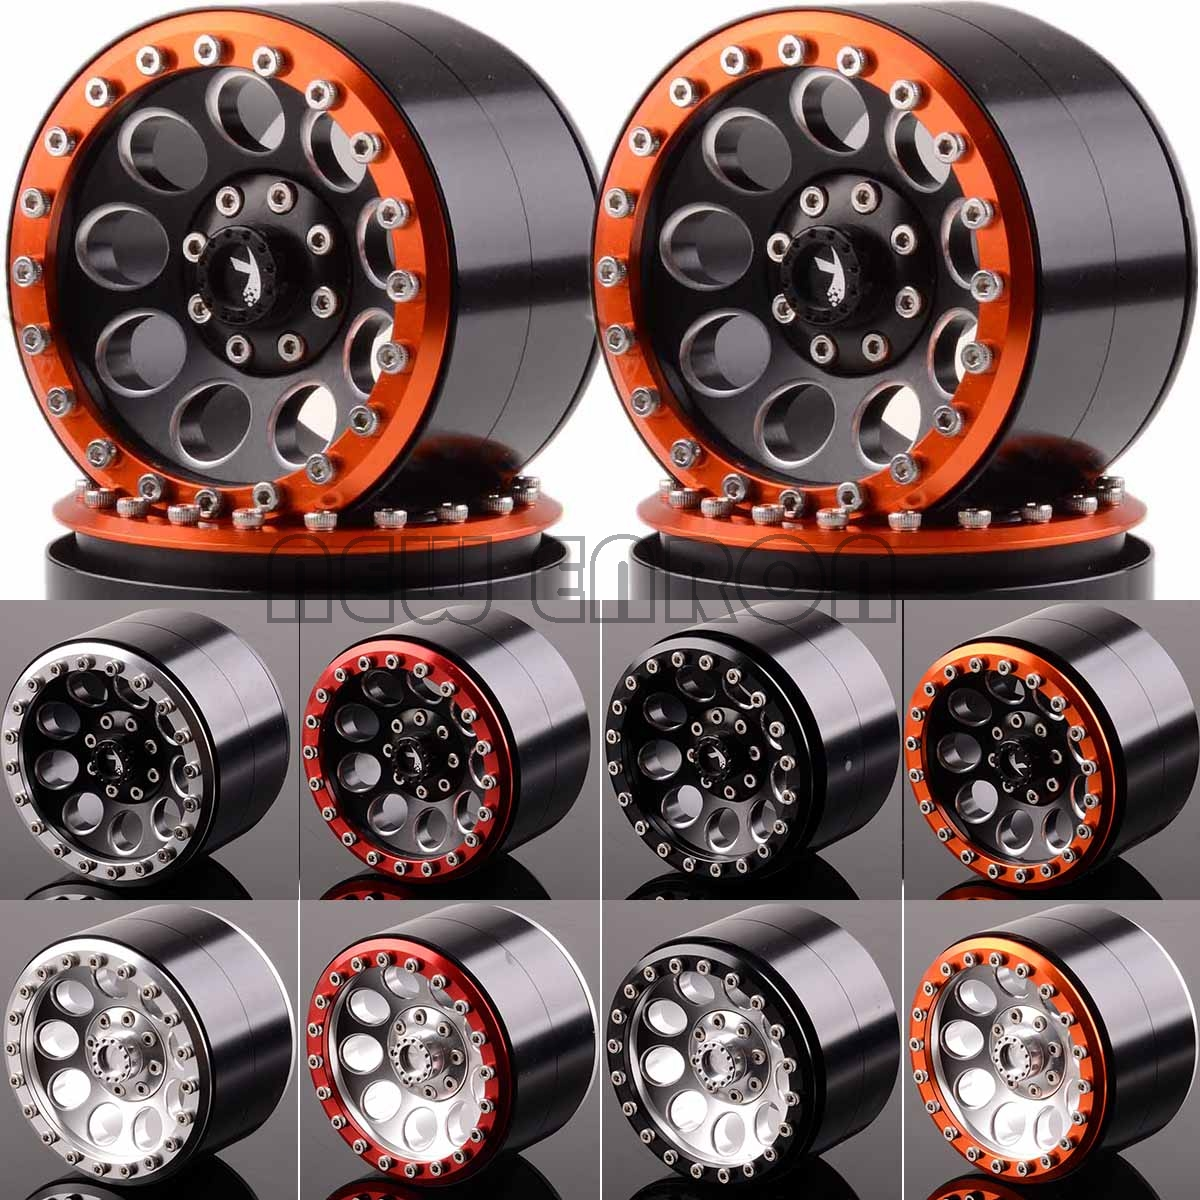 NEW ENRON 4P Aluminum 2.2 Inch Beadlock Wheel Rim Hub Fit FOR RC Rock Crawler Axial SCX10 RR10 Wraith 90048 90018 TRX4 TRX-4 KM2(China)